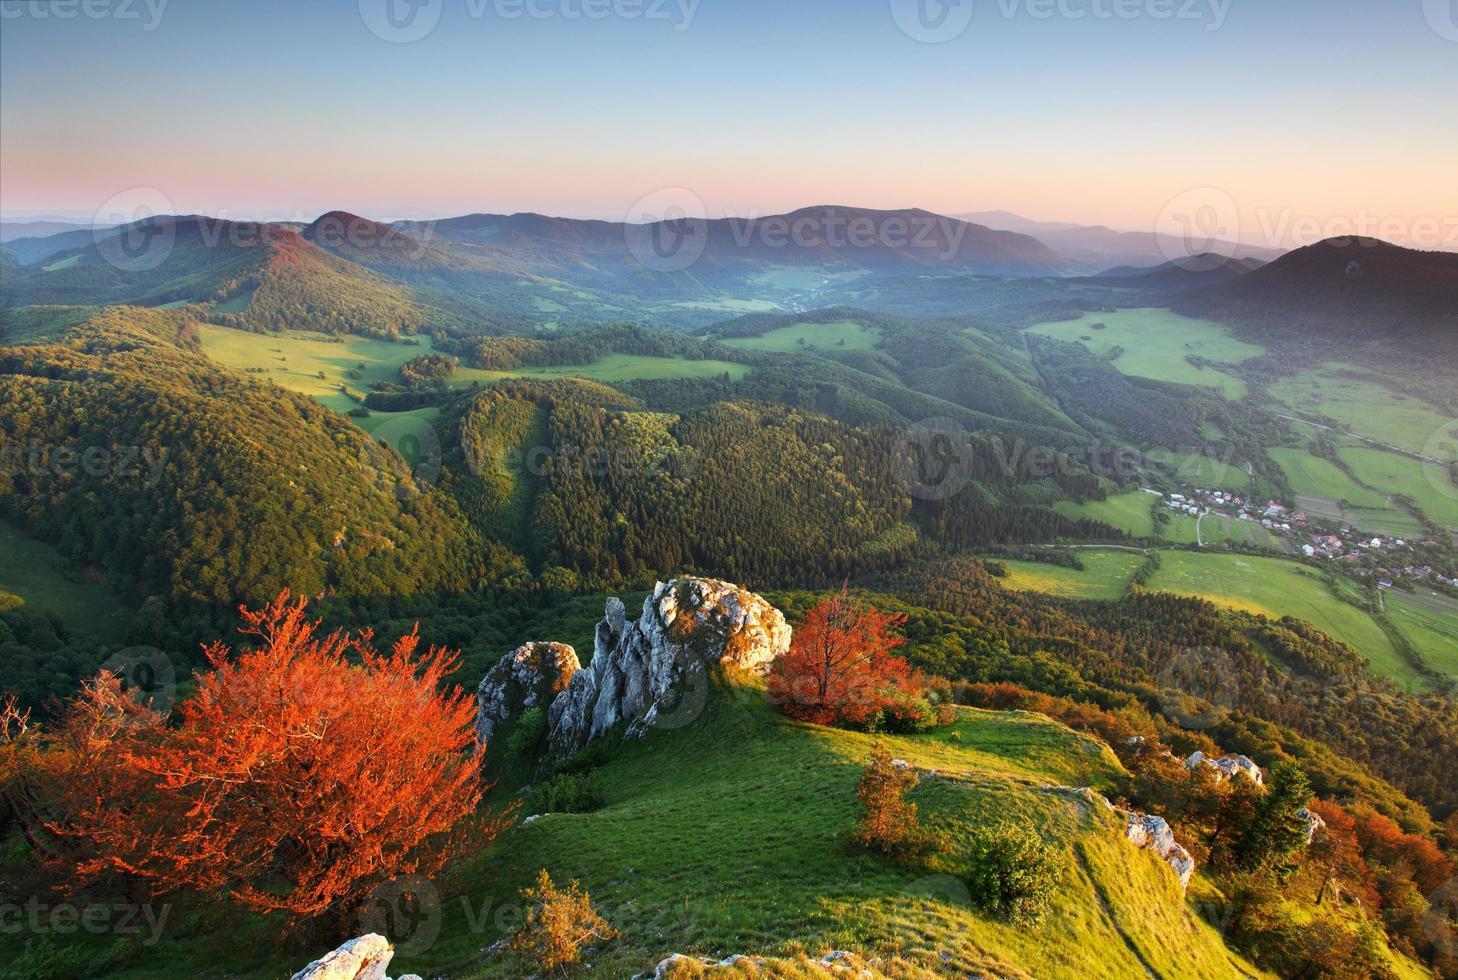 An overhead autumn mountain view photo